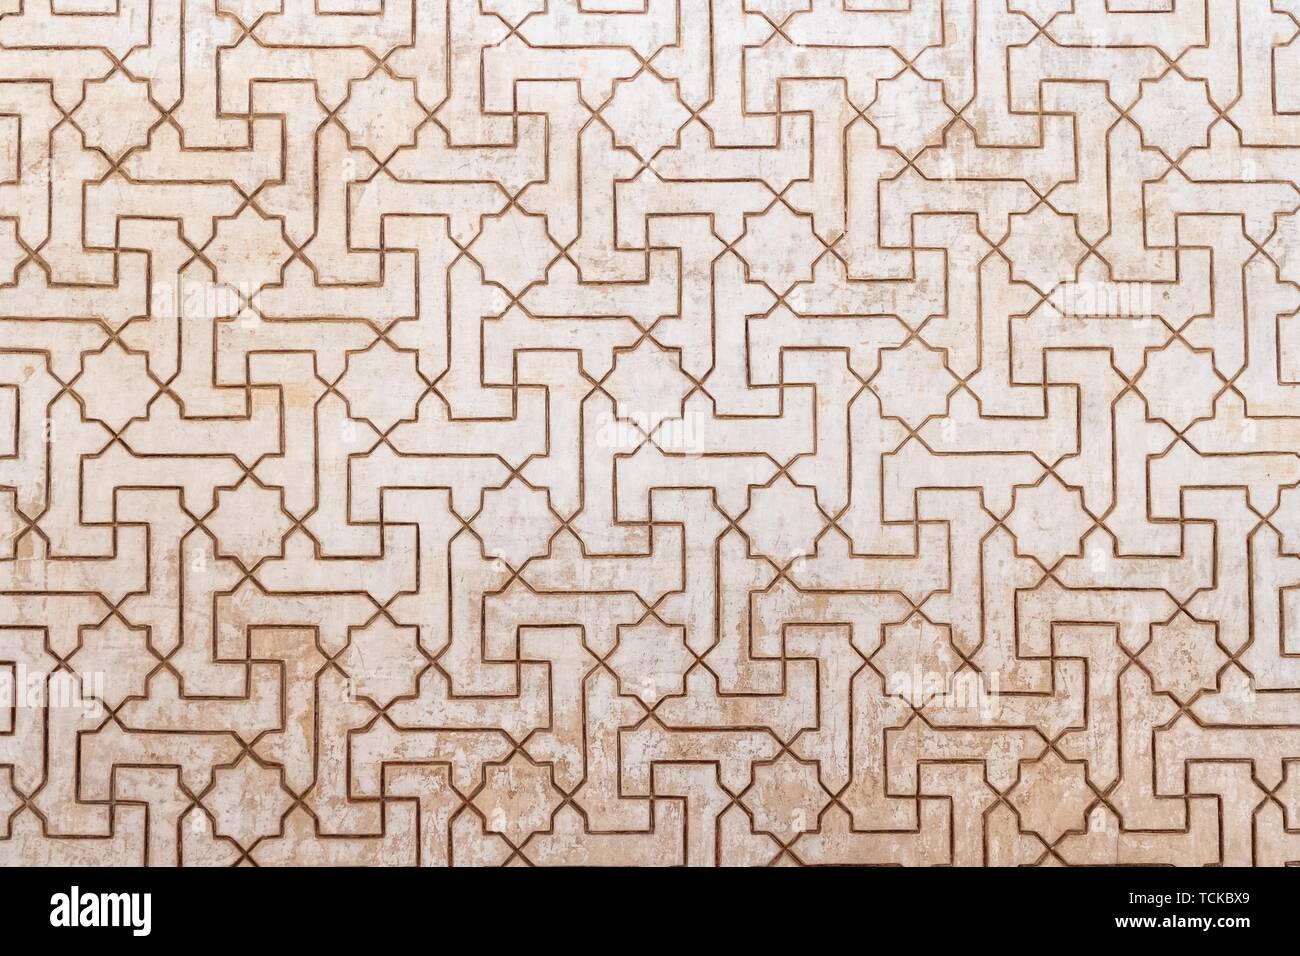 Geometric Moorish plaster decorations, Nazarite palaces, Alhambra, Granada, Andalusia, Spain - Stock Image